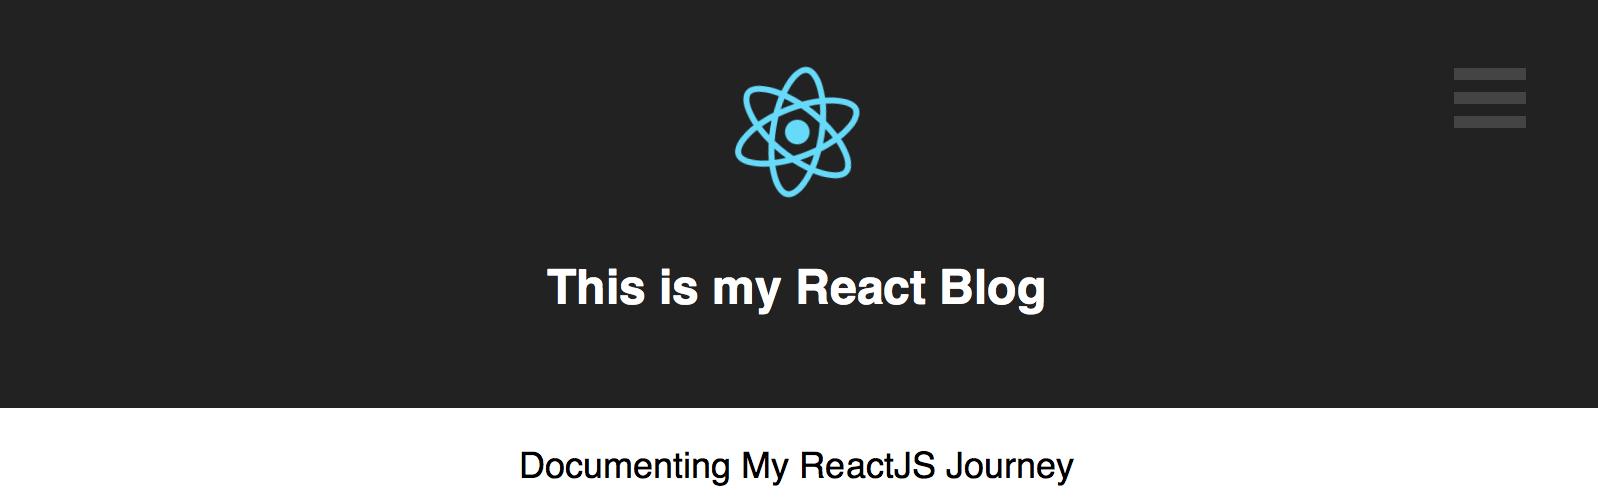 react-blog